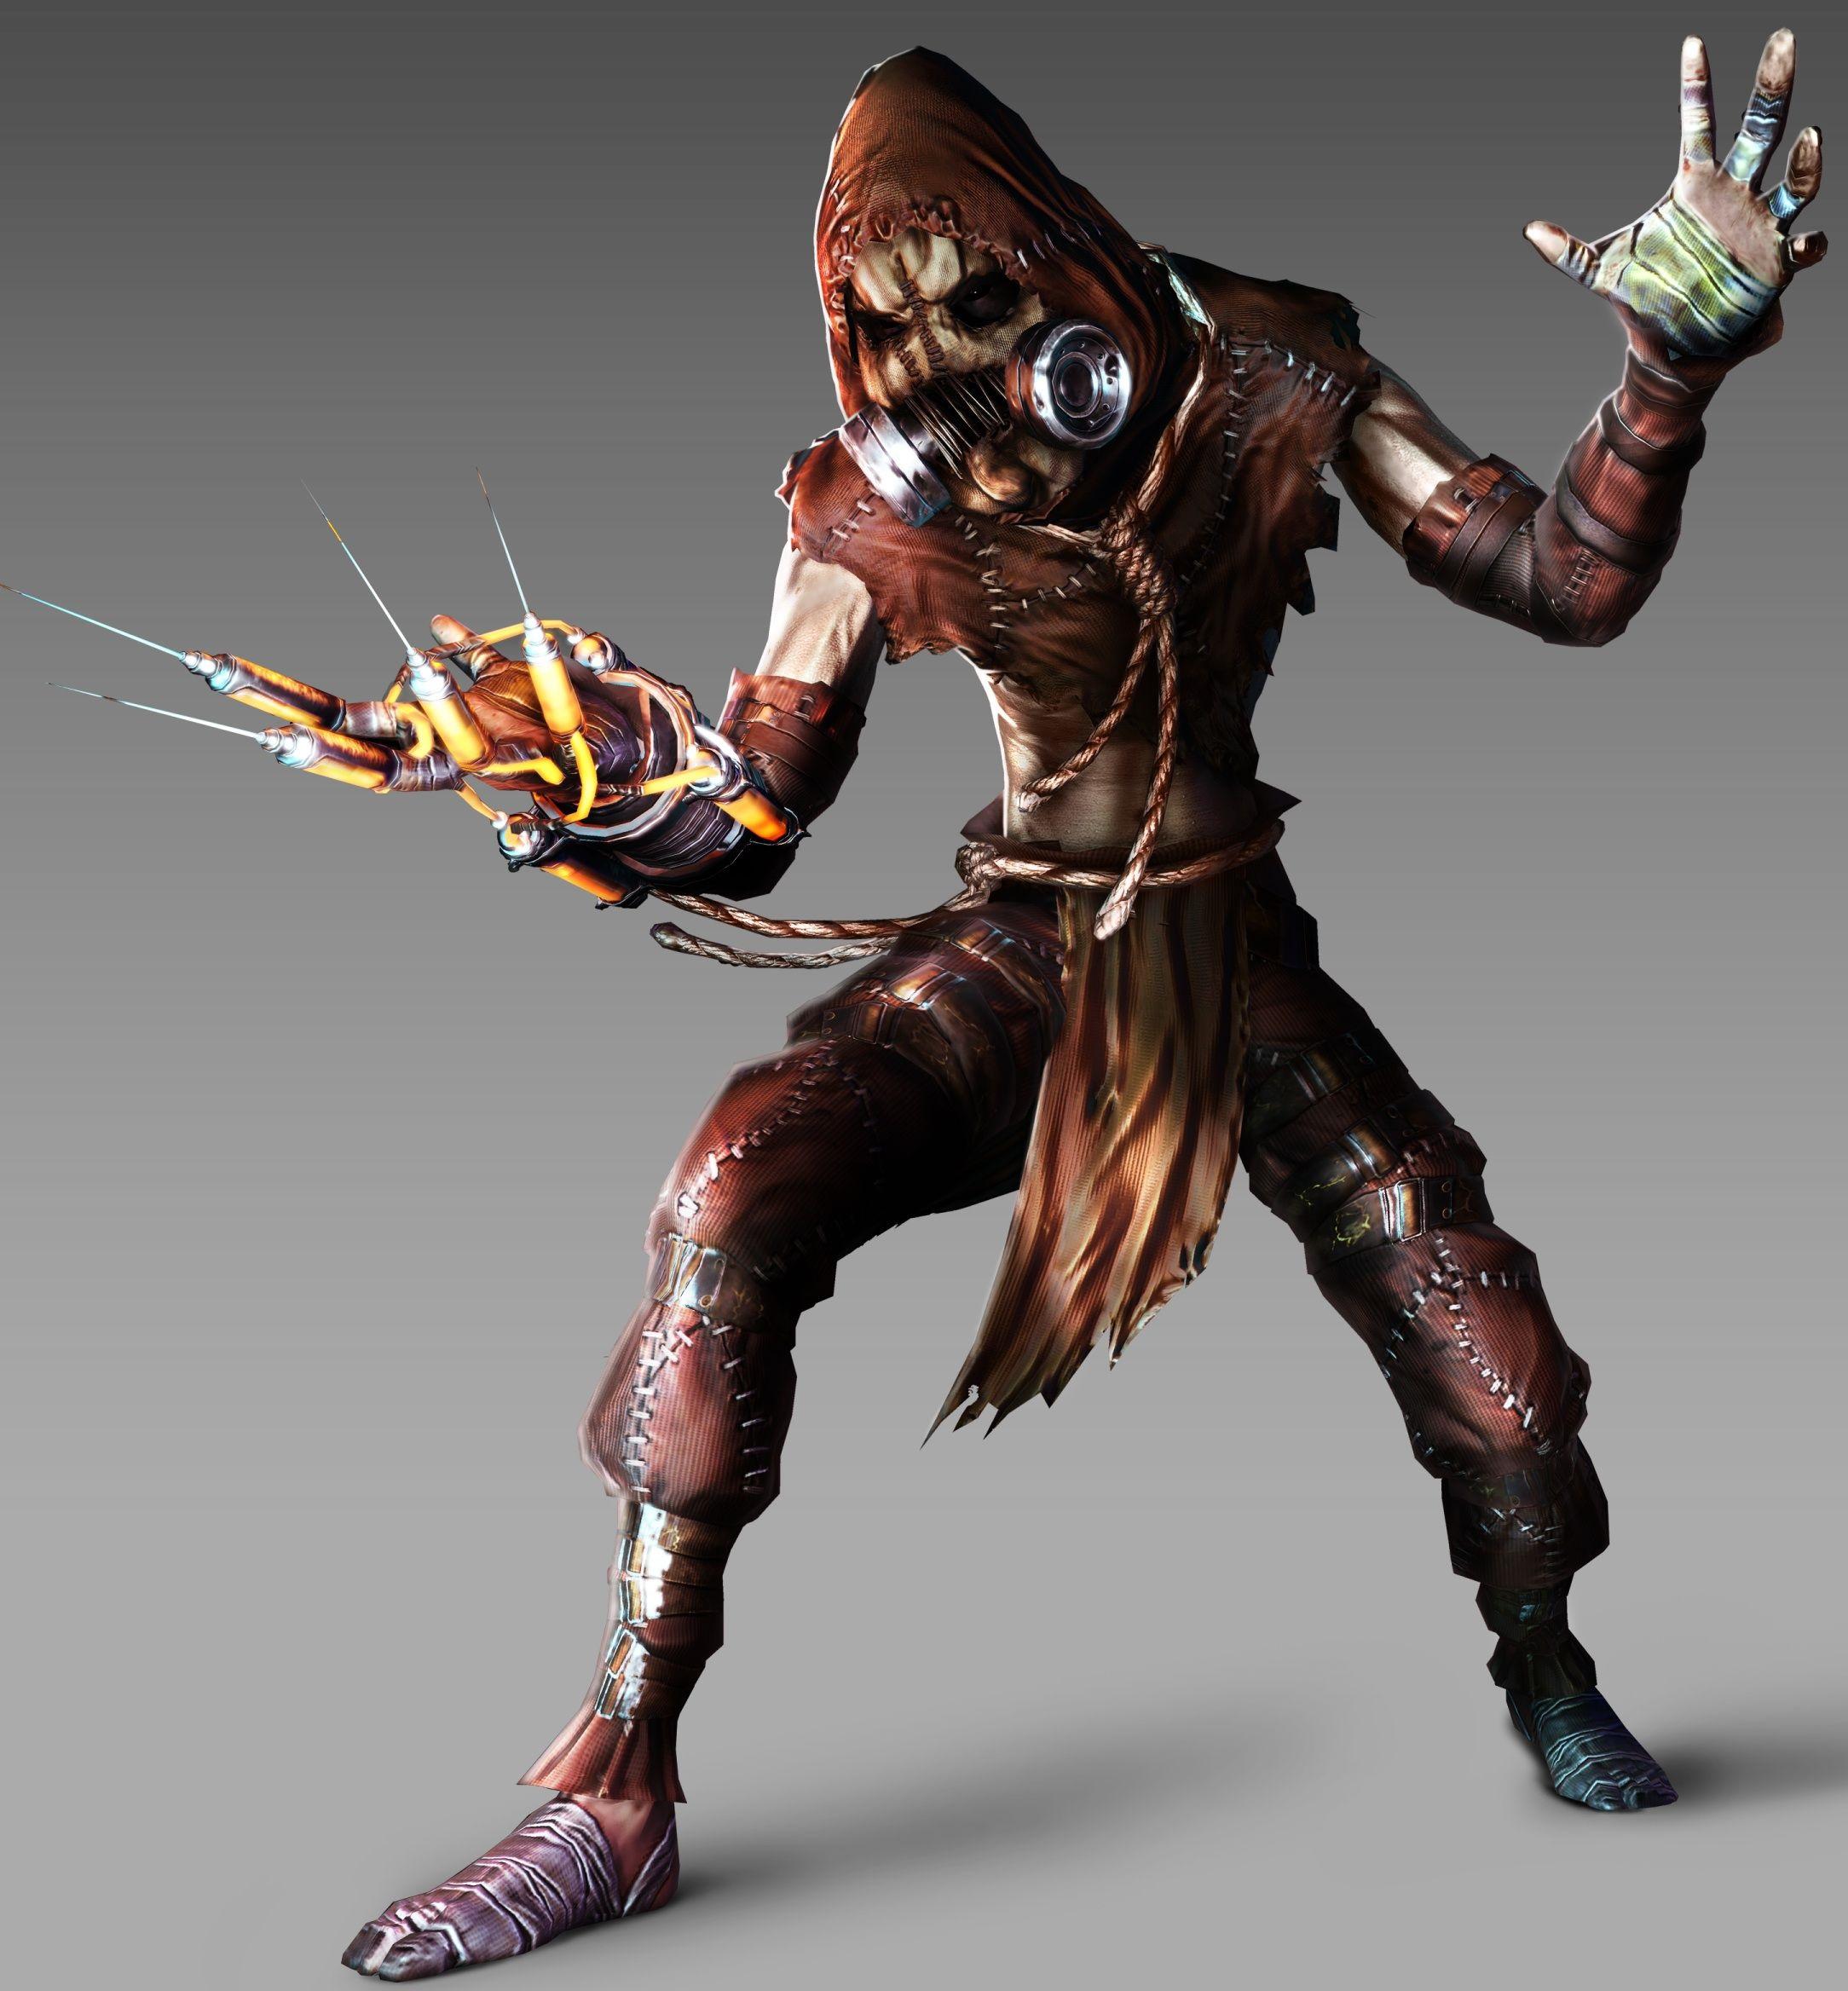 image scarecrow batman arkham asylum game character artwork jpg